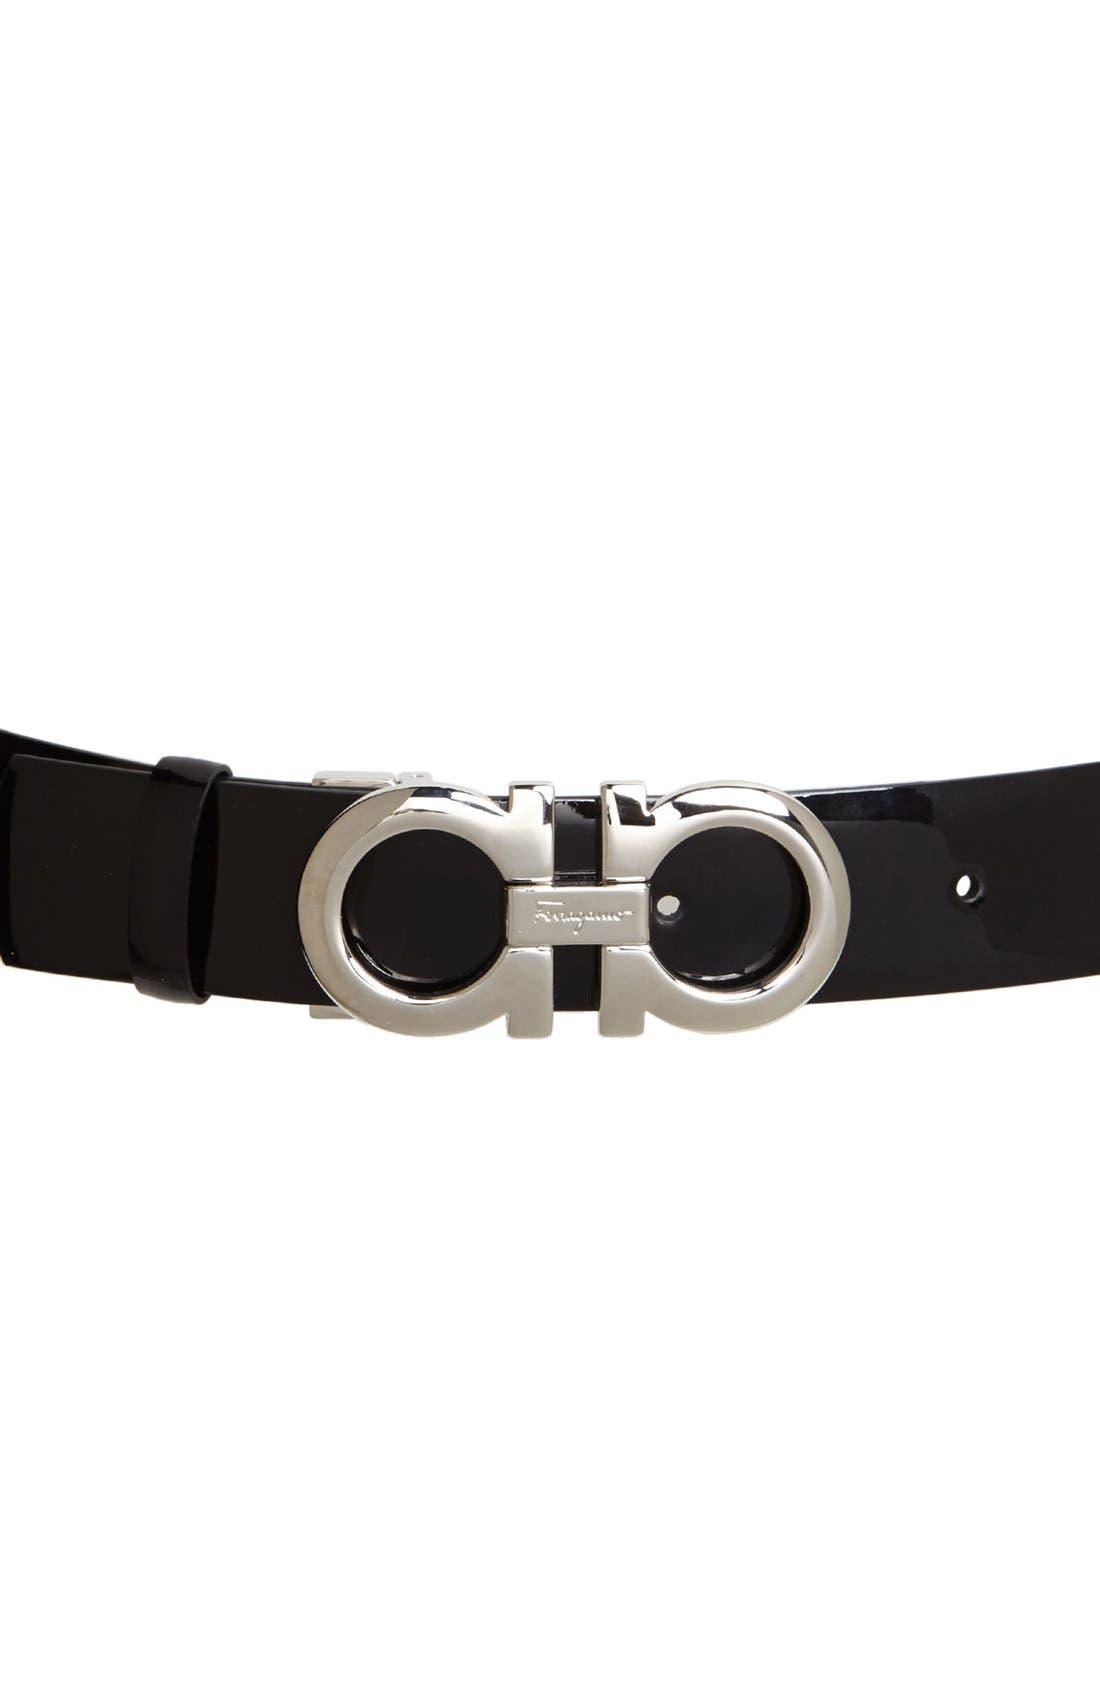 Alternate Image 2  - Salvatore Ferragamo Patent Leather Belt